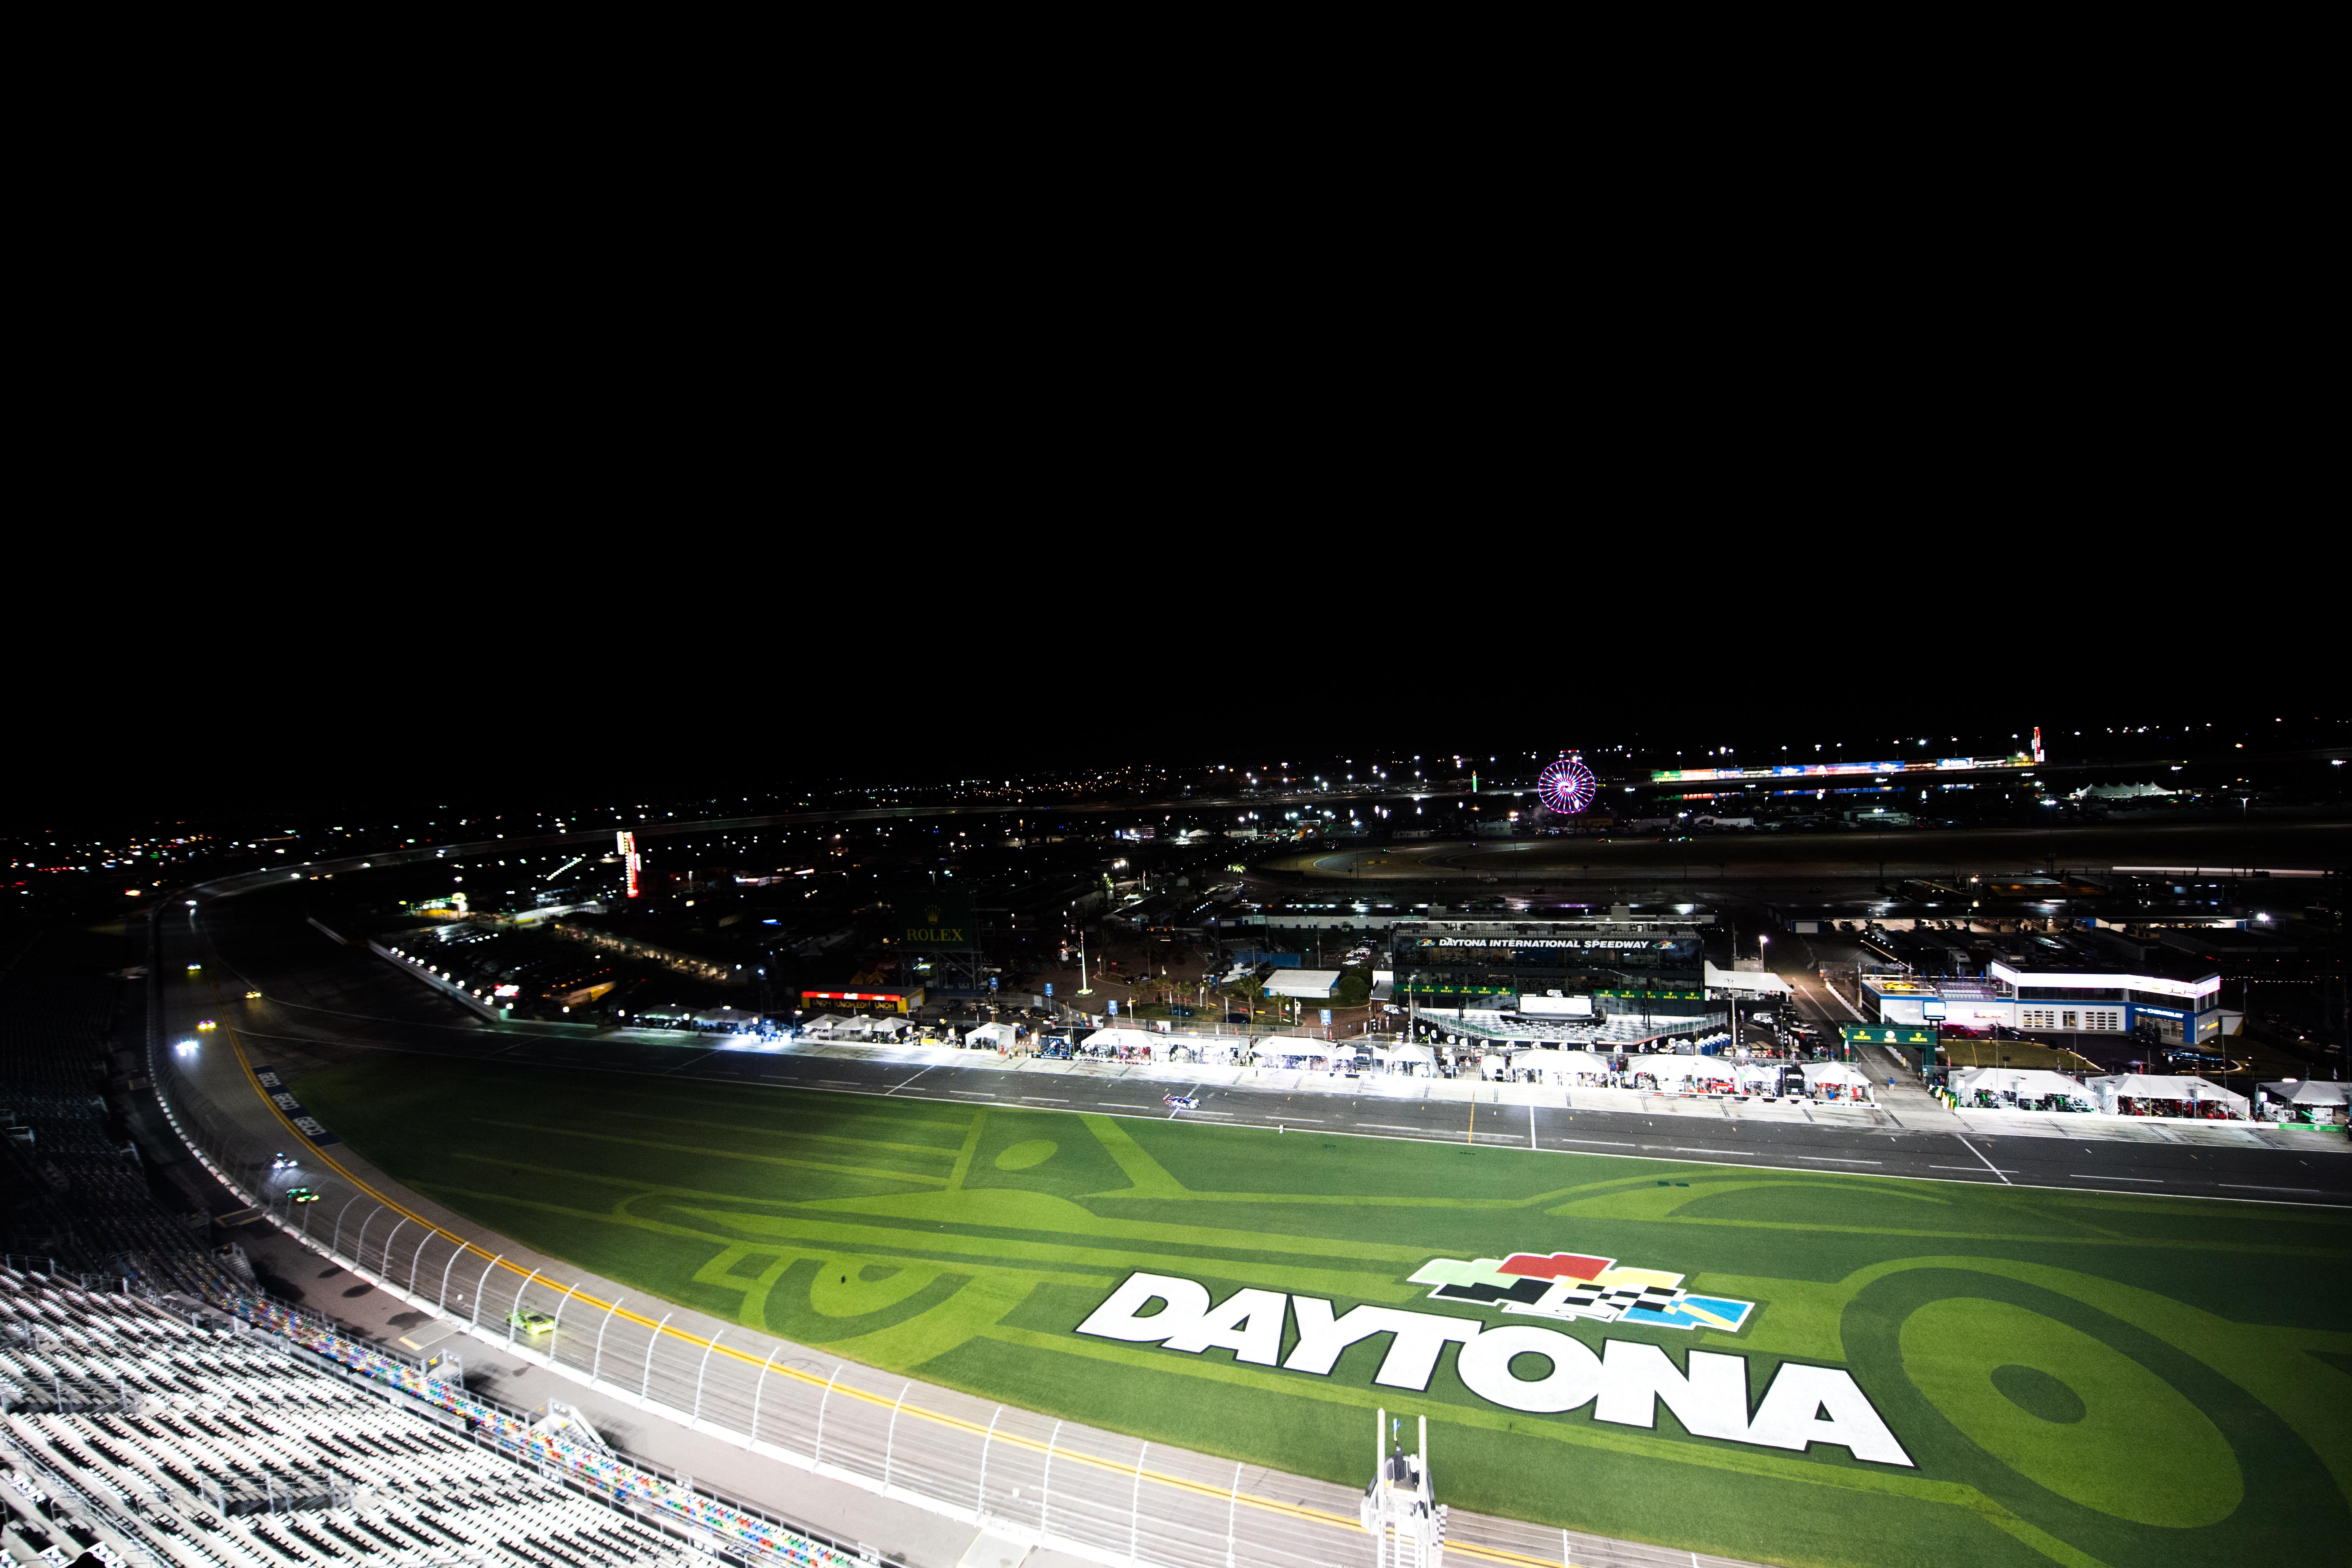 Motor Racing Formula One World Championship Imsa Weathertech Series Rolex 24 Hrs Of Daytona